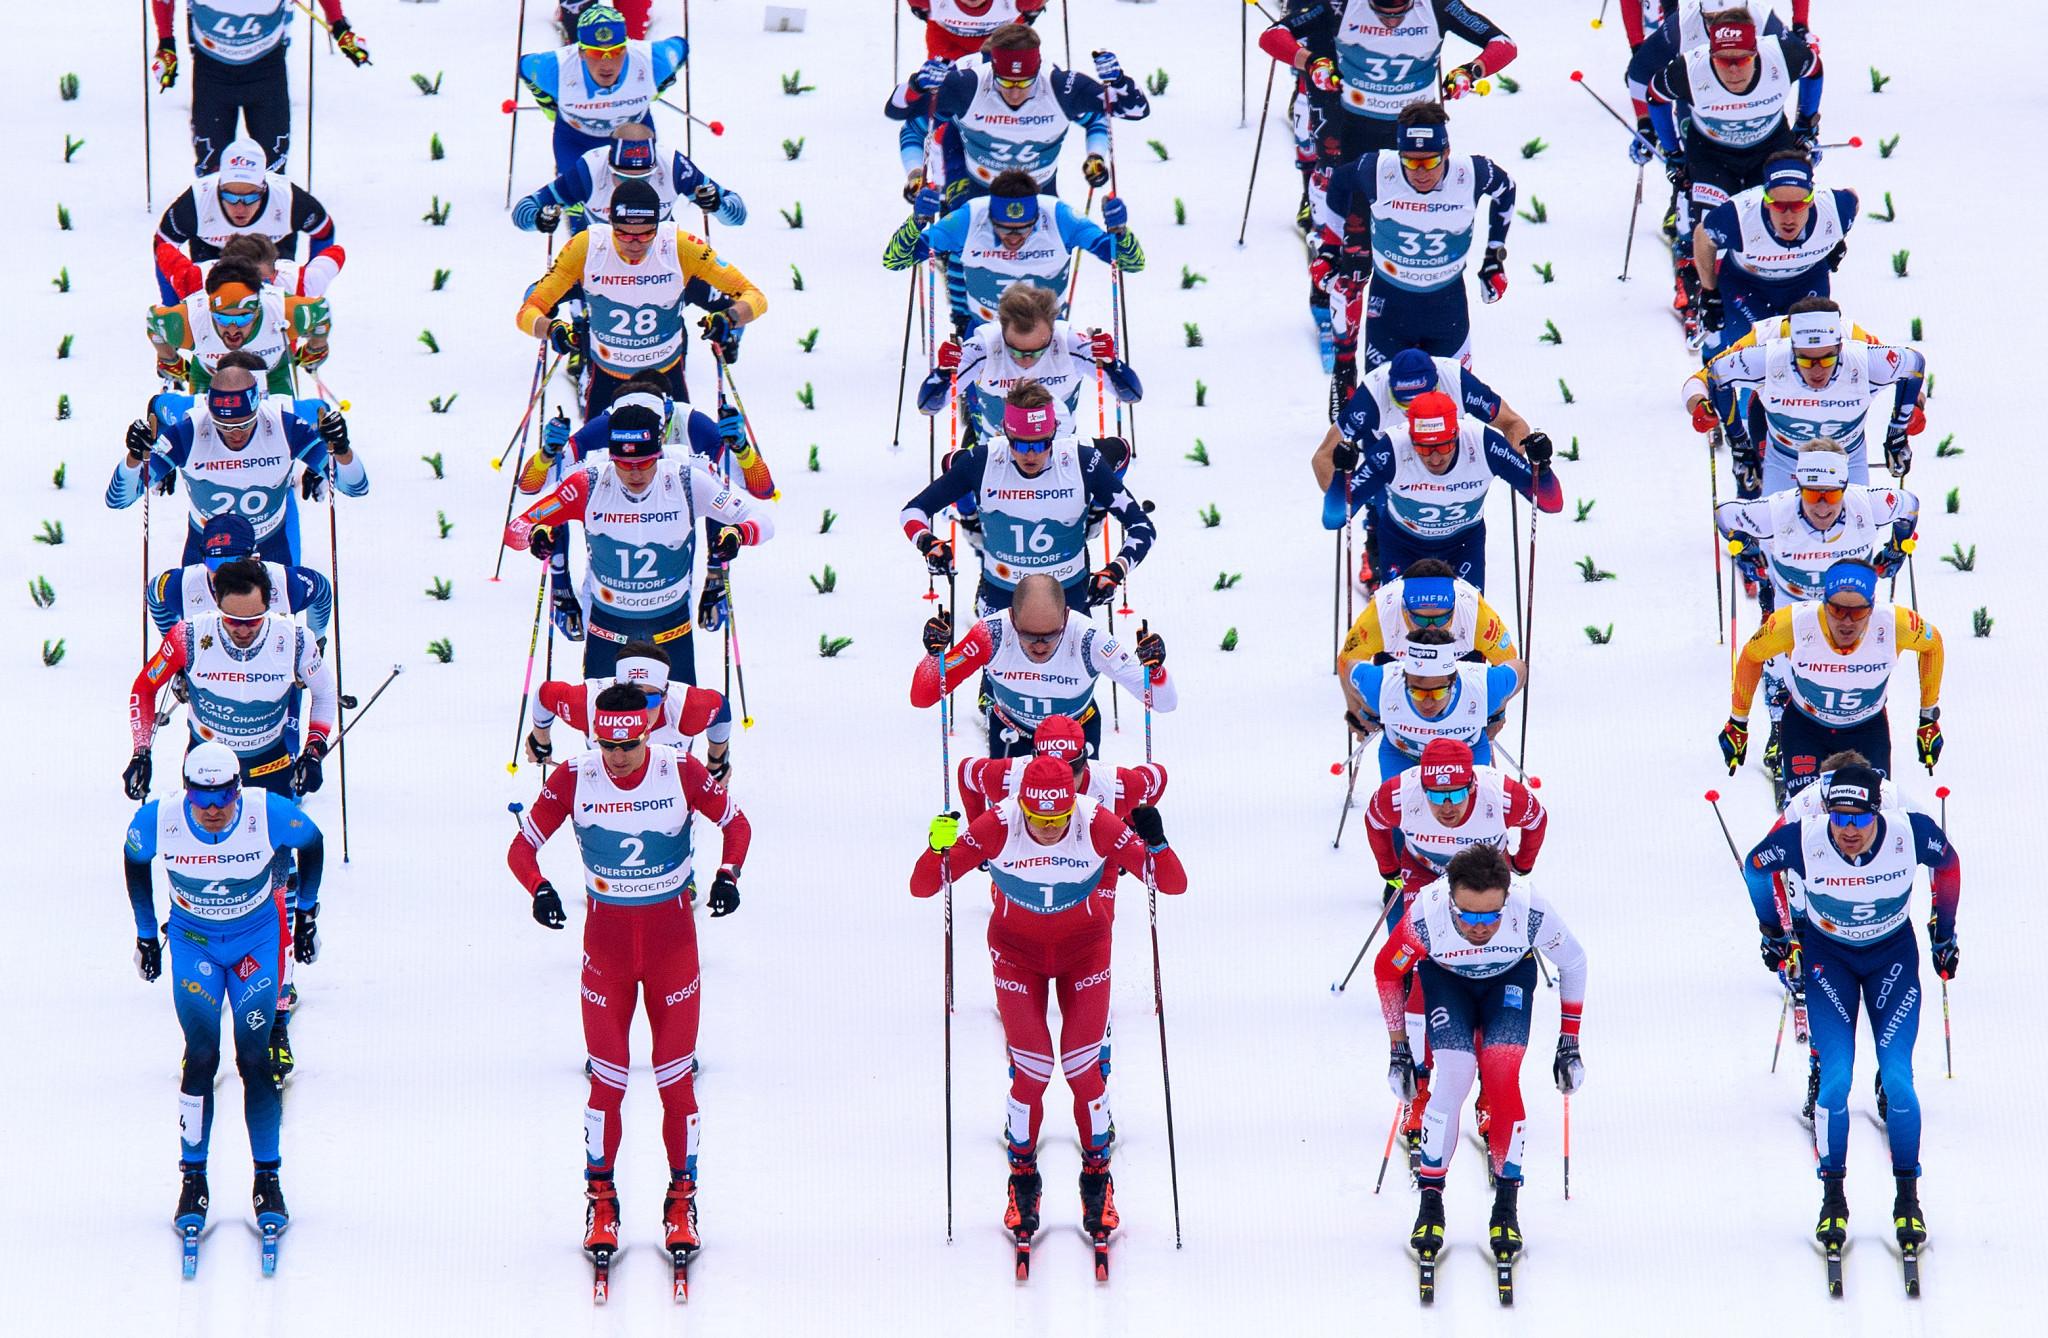 FIS holds debrief with 2021 Nordic World Ski Championships host Oberstdorf